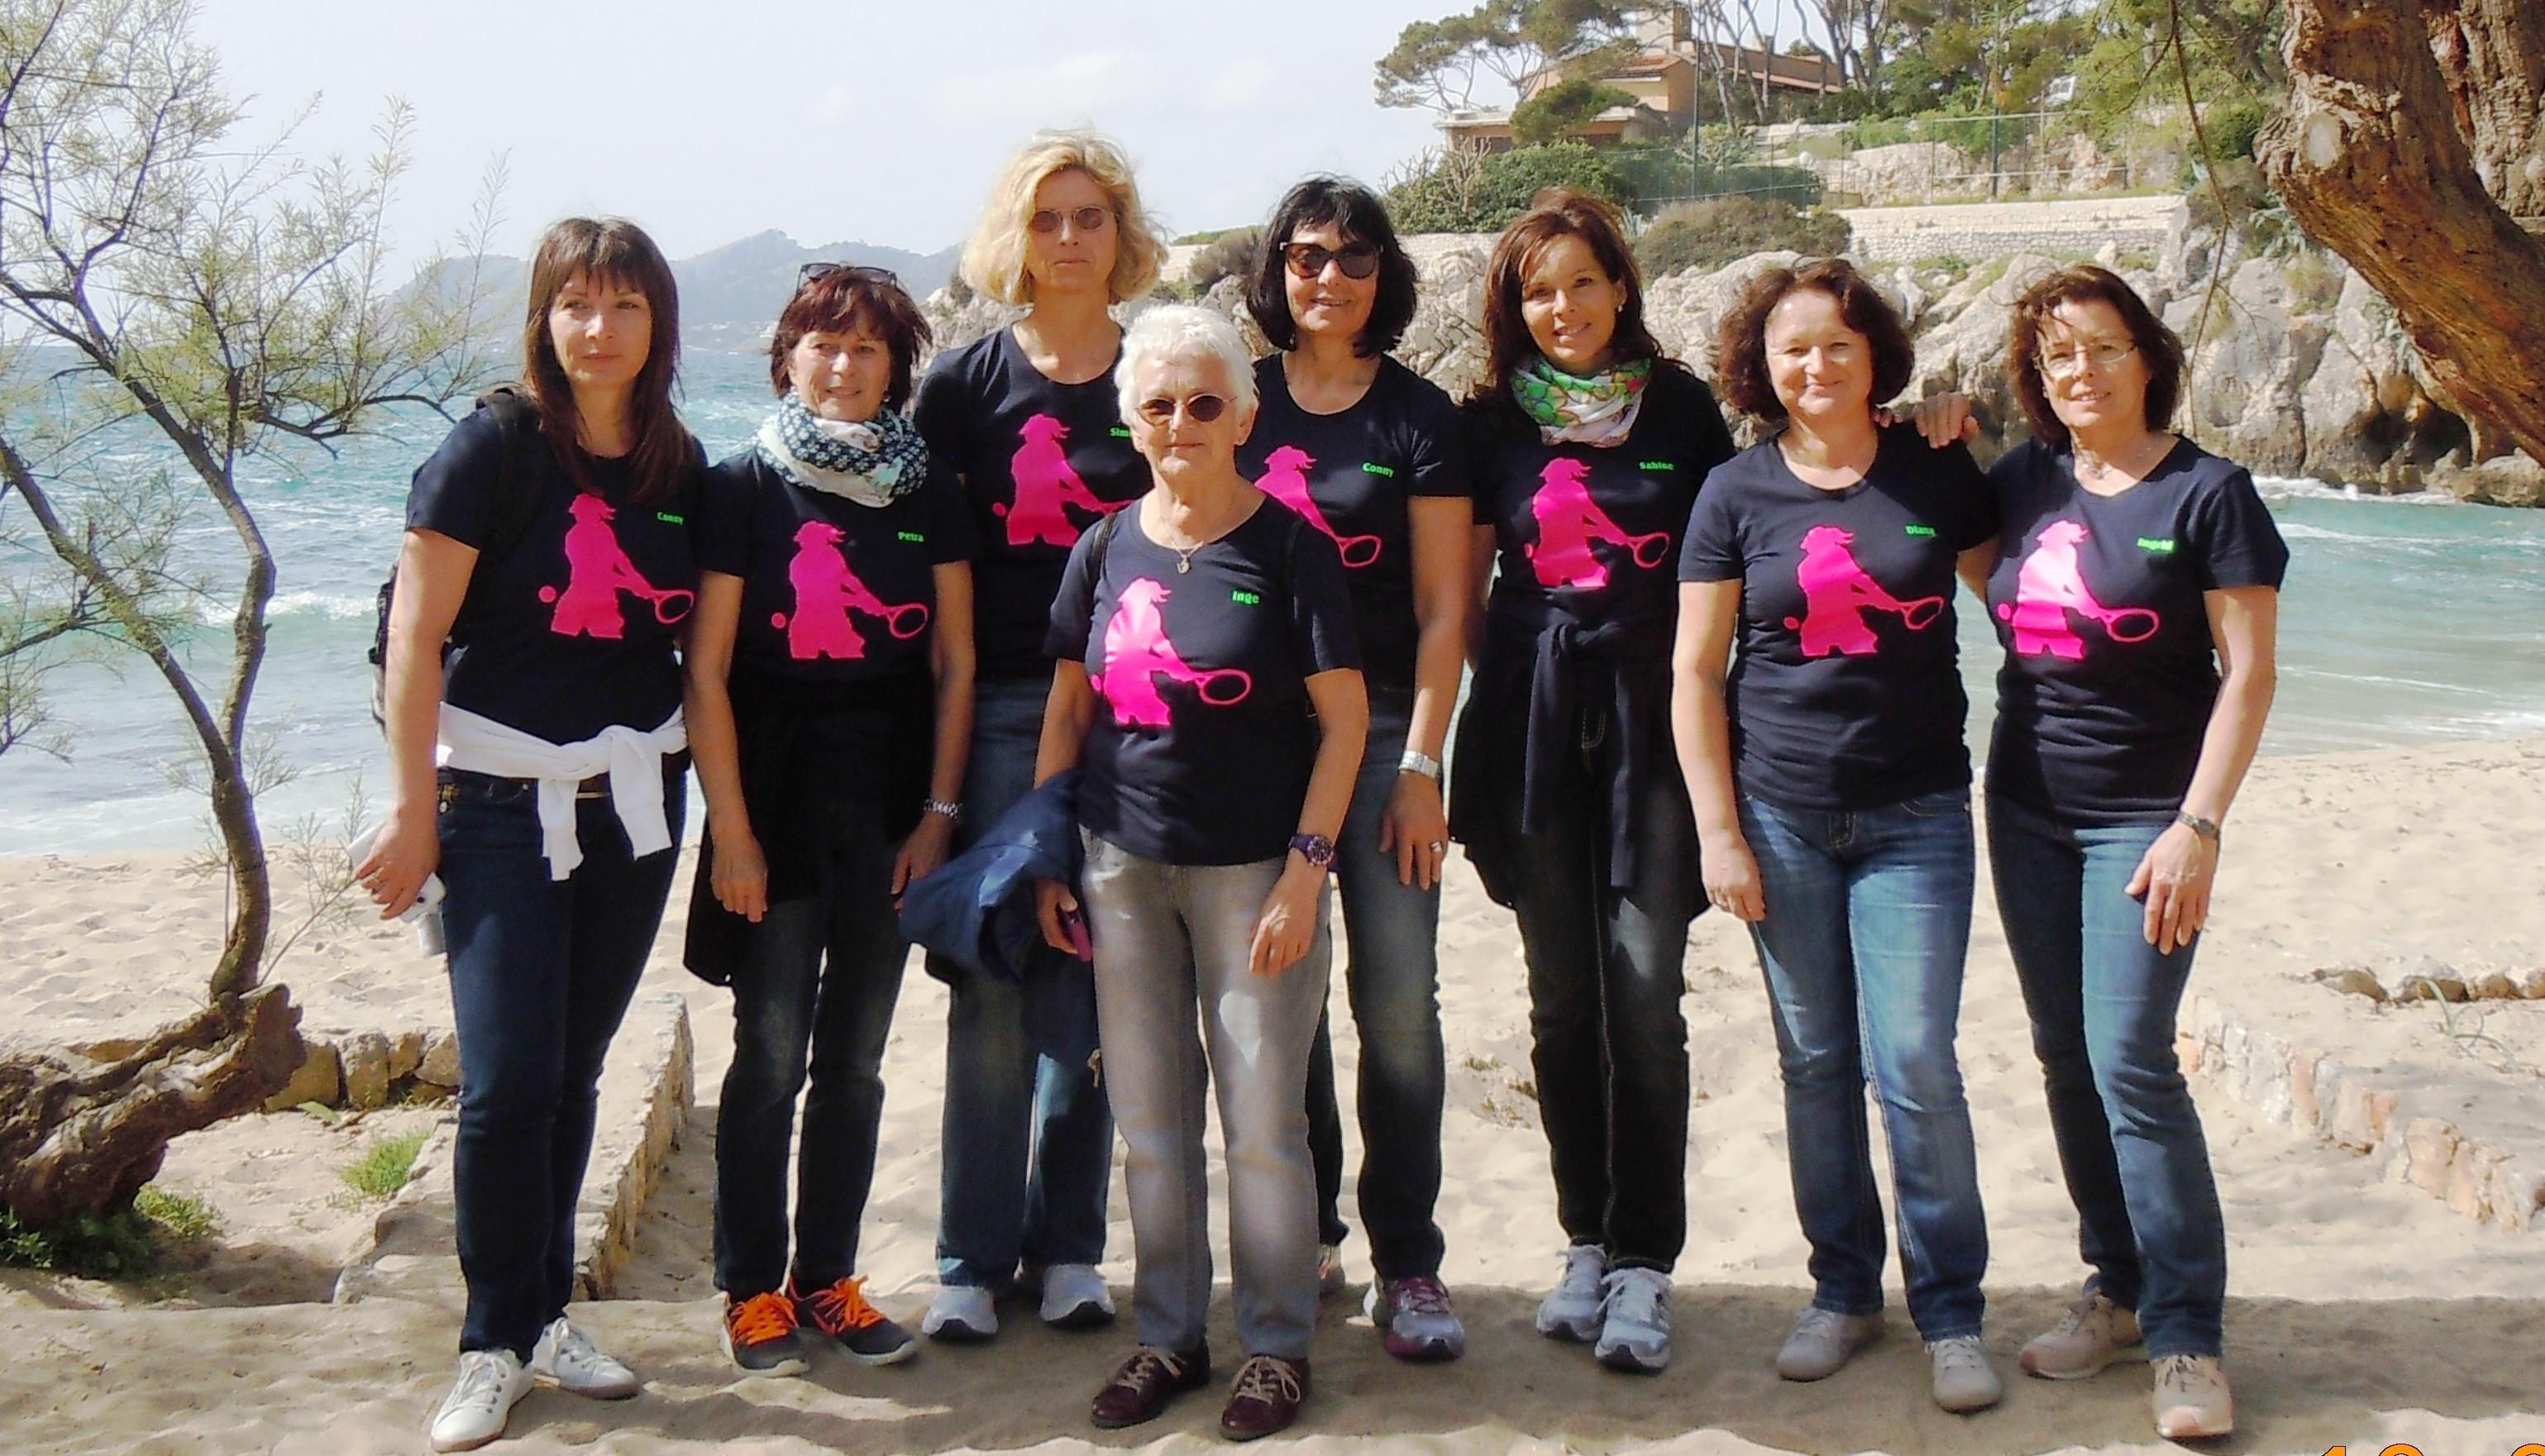 Damen 40: Hinten, von links: Cornelia Leibrich, Petra Zohn, Simone Ebert, Cornelia Pommerening, Sabine Diehl, Diana Jakob, Ingrid Schinz.  Vorne: Inge Pome (es fehlt: Birgitt Rüd)